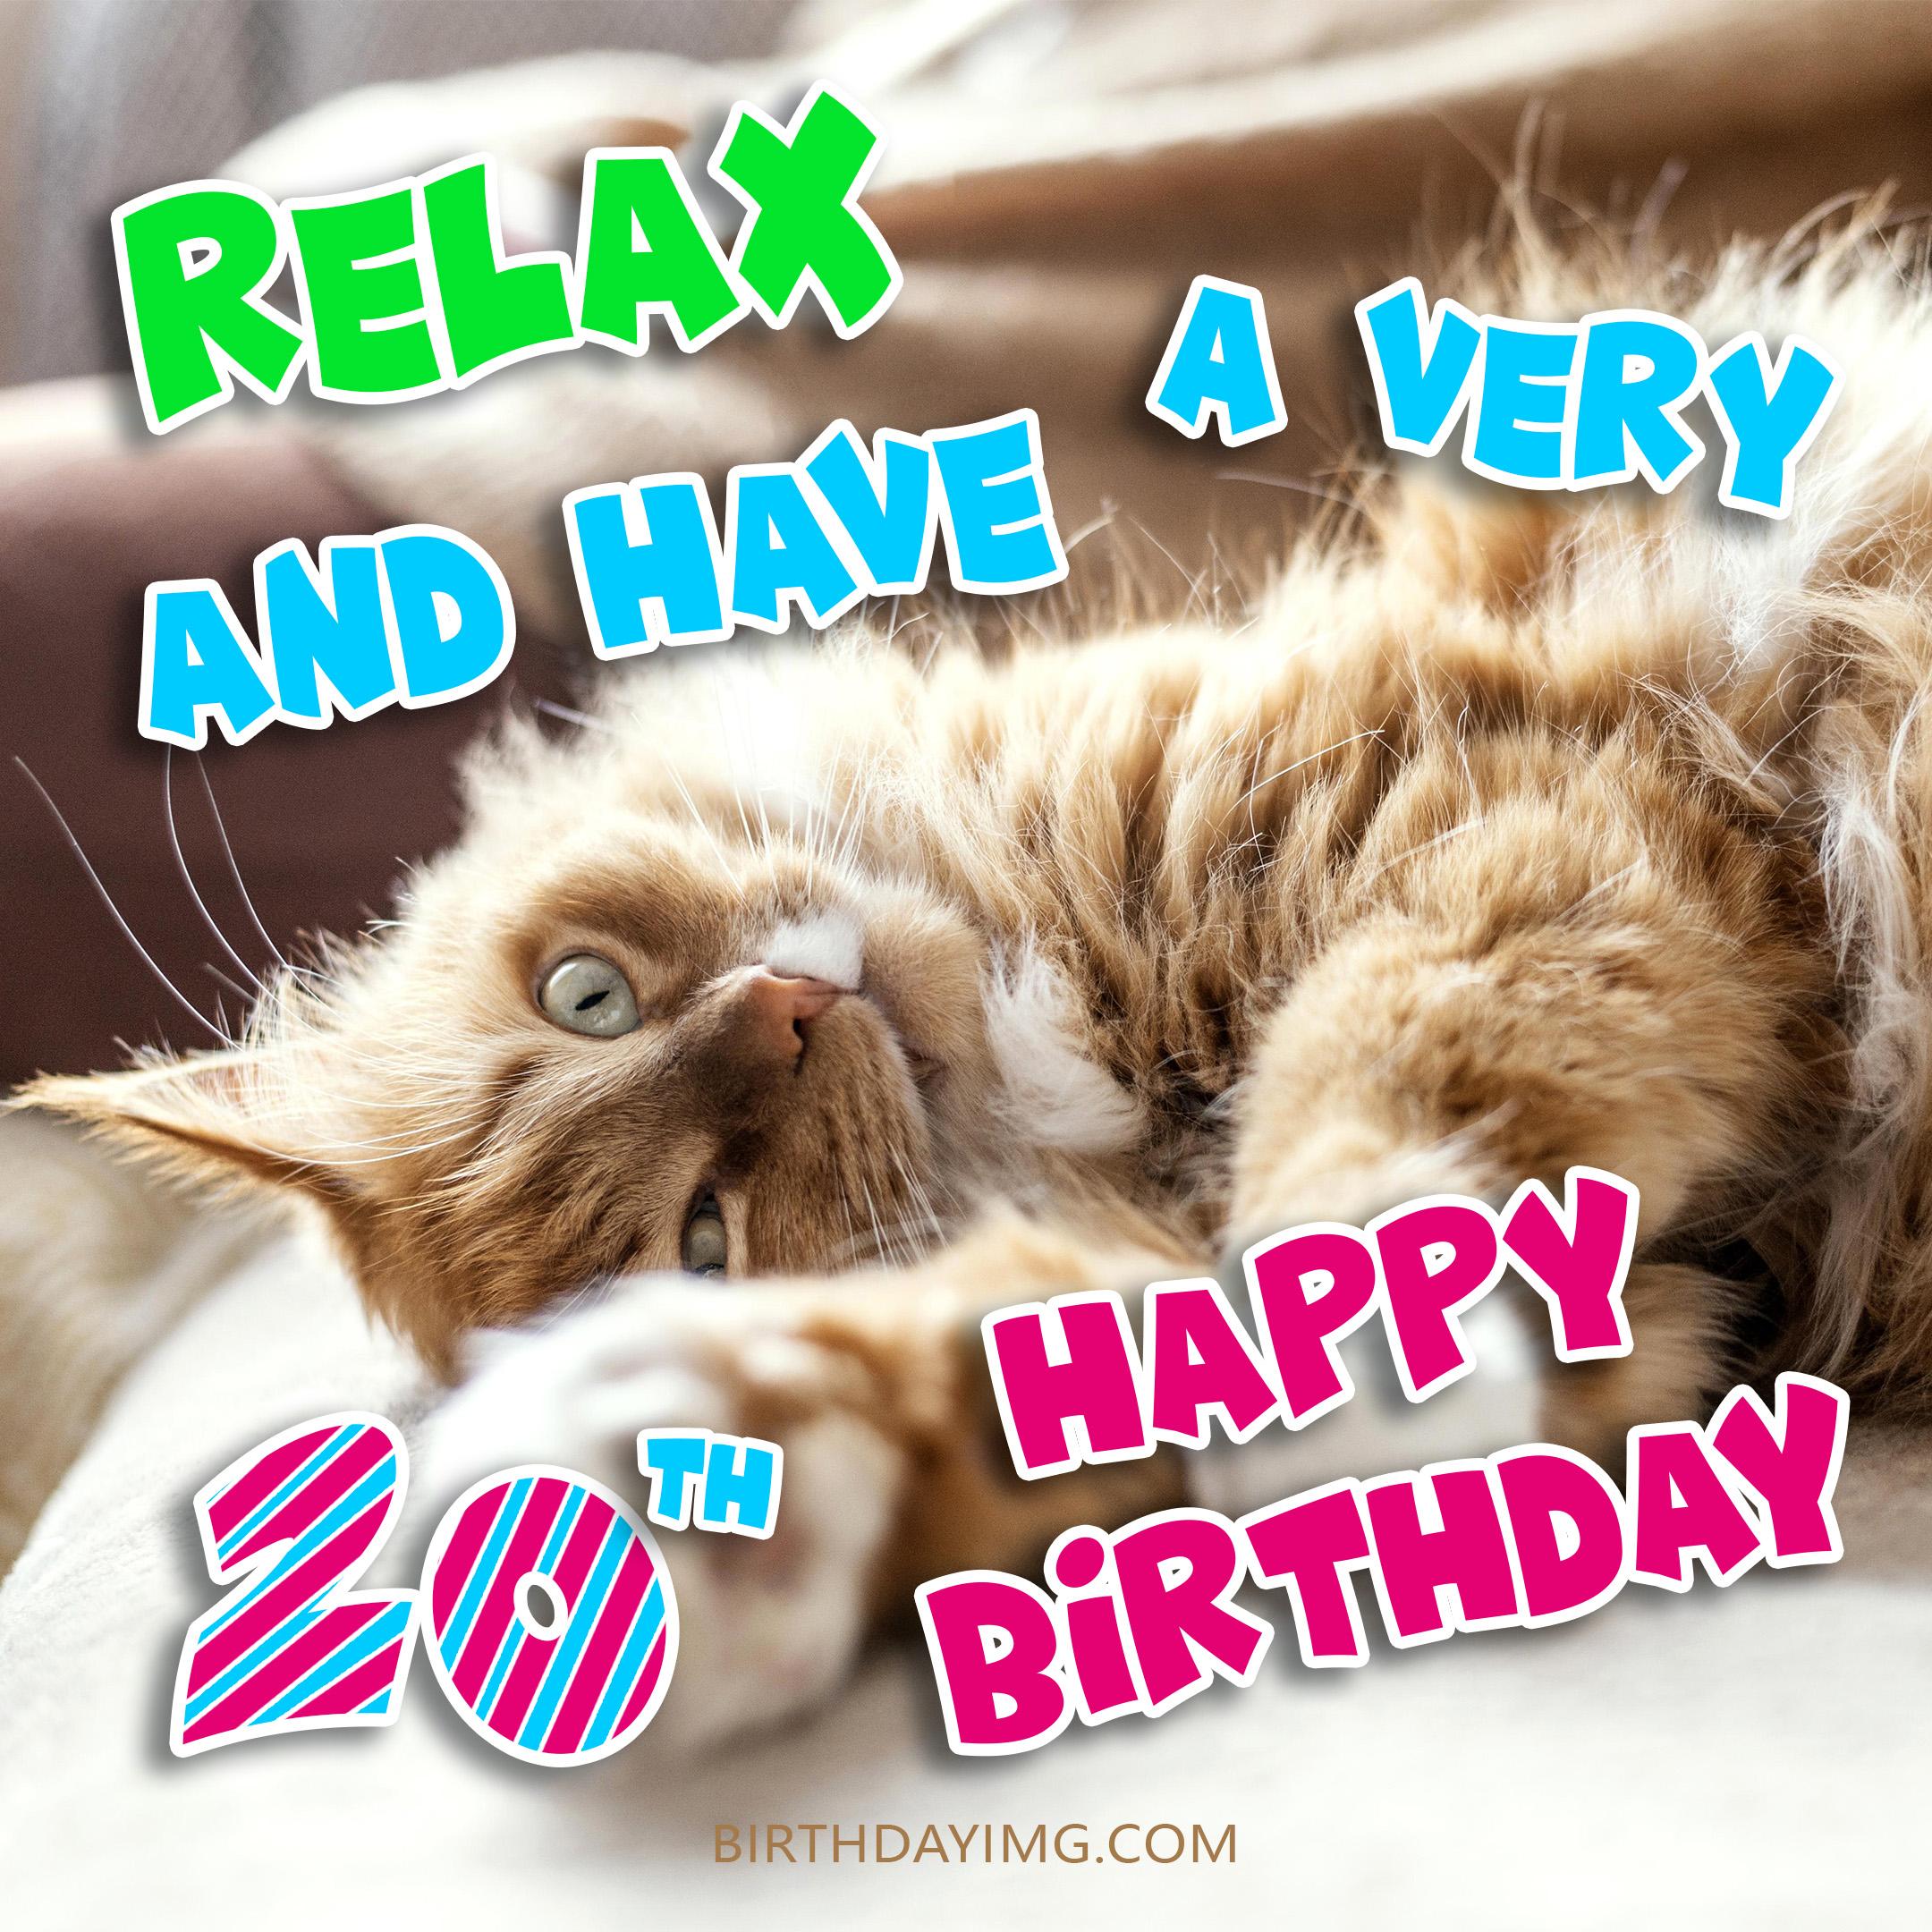 Free 20th Years Happy Birthday Image With Playful Cat - birthdayimg.com